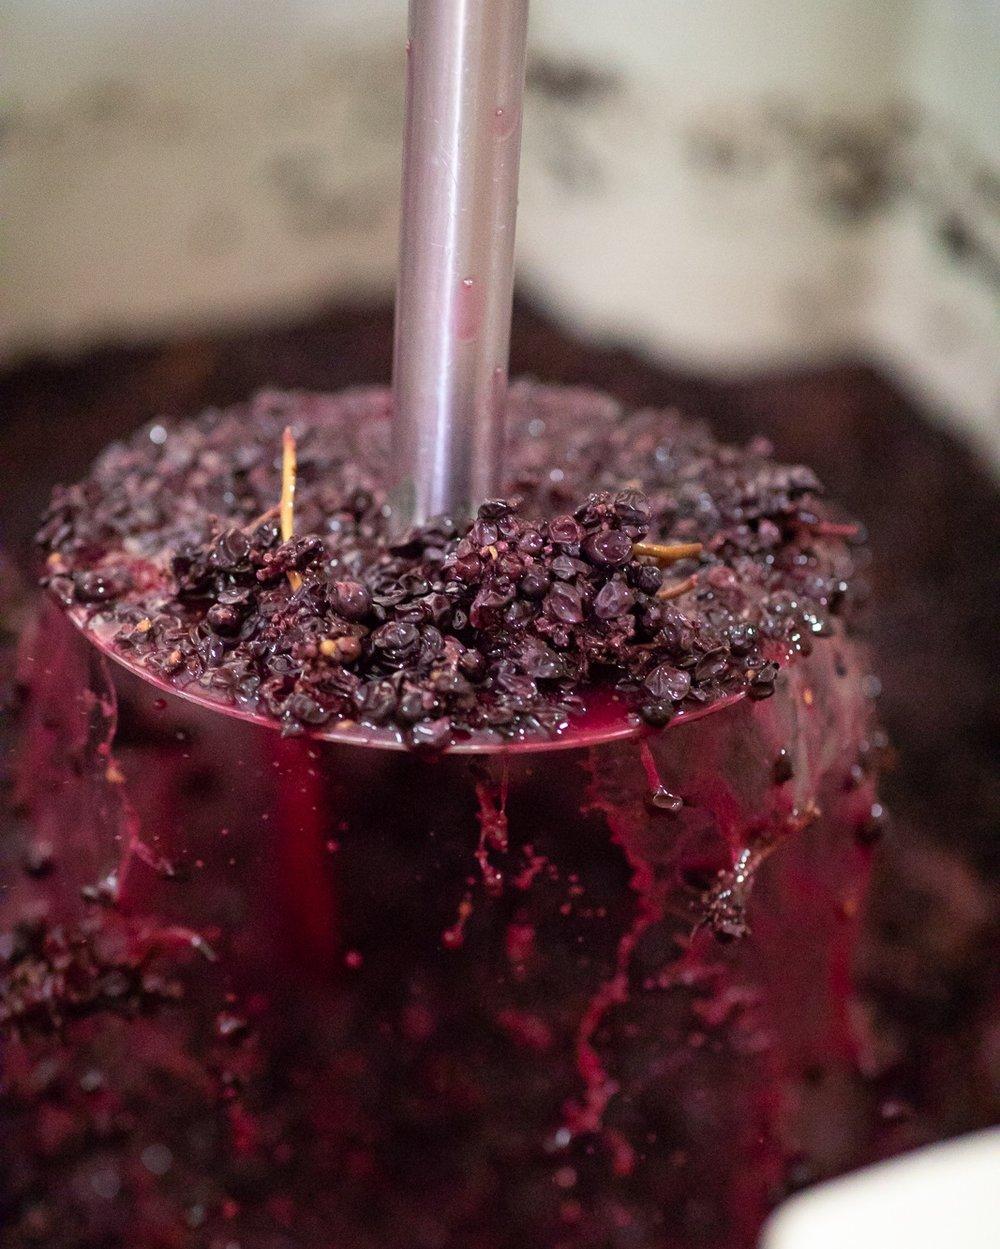 Darling+Wines+-+Petaluma+Gap+Harvest+2018+-+Small+Size+%2889+of+91%29.jpg